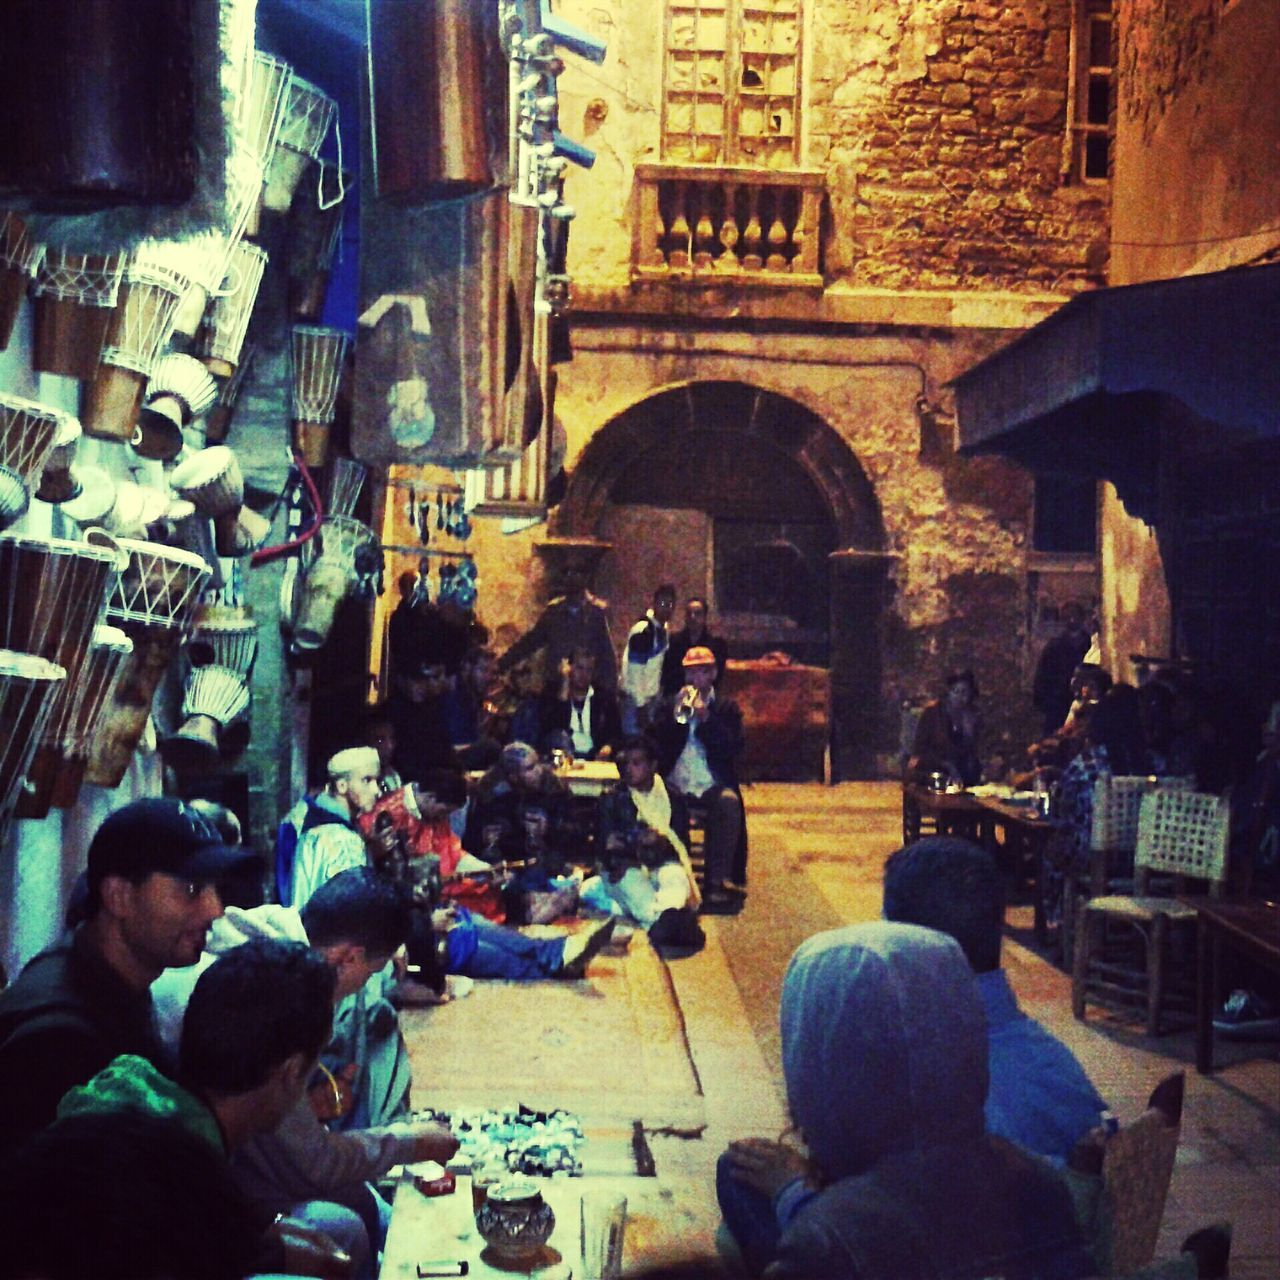 Festival Gnawa D'essaouira Gnawa Music Morocco